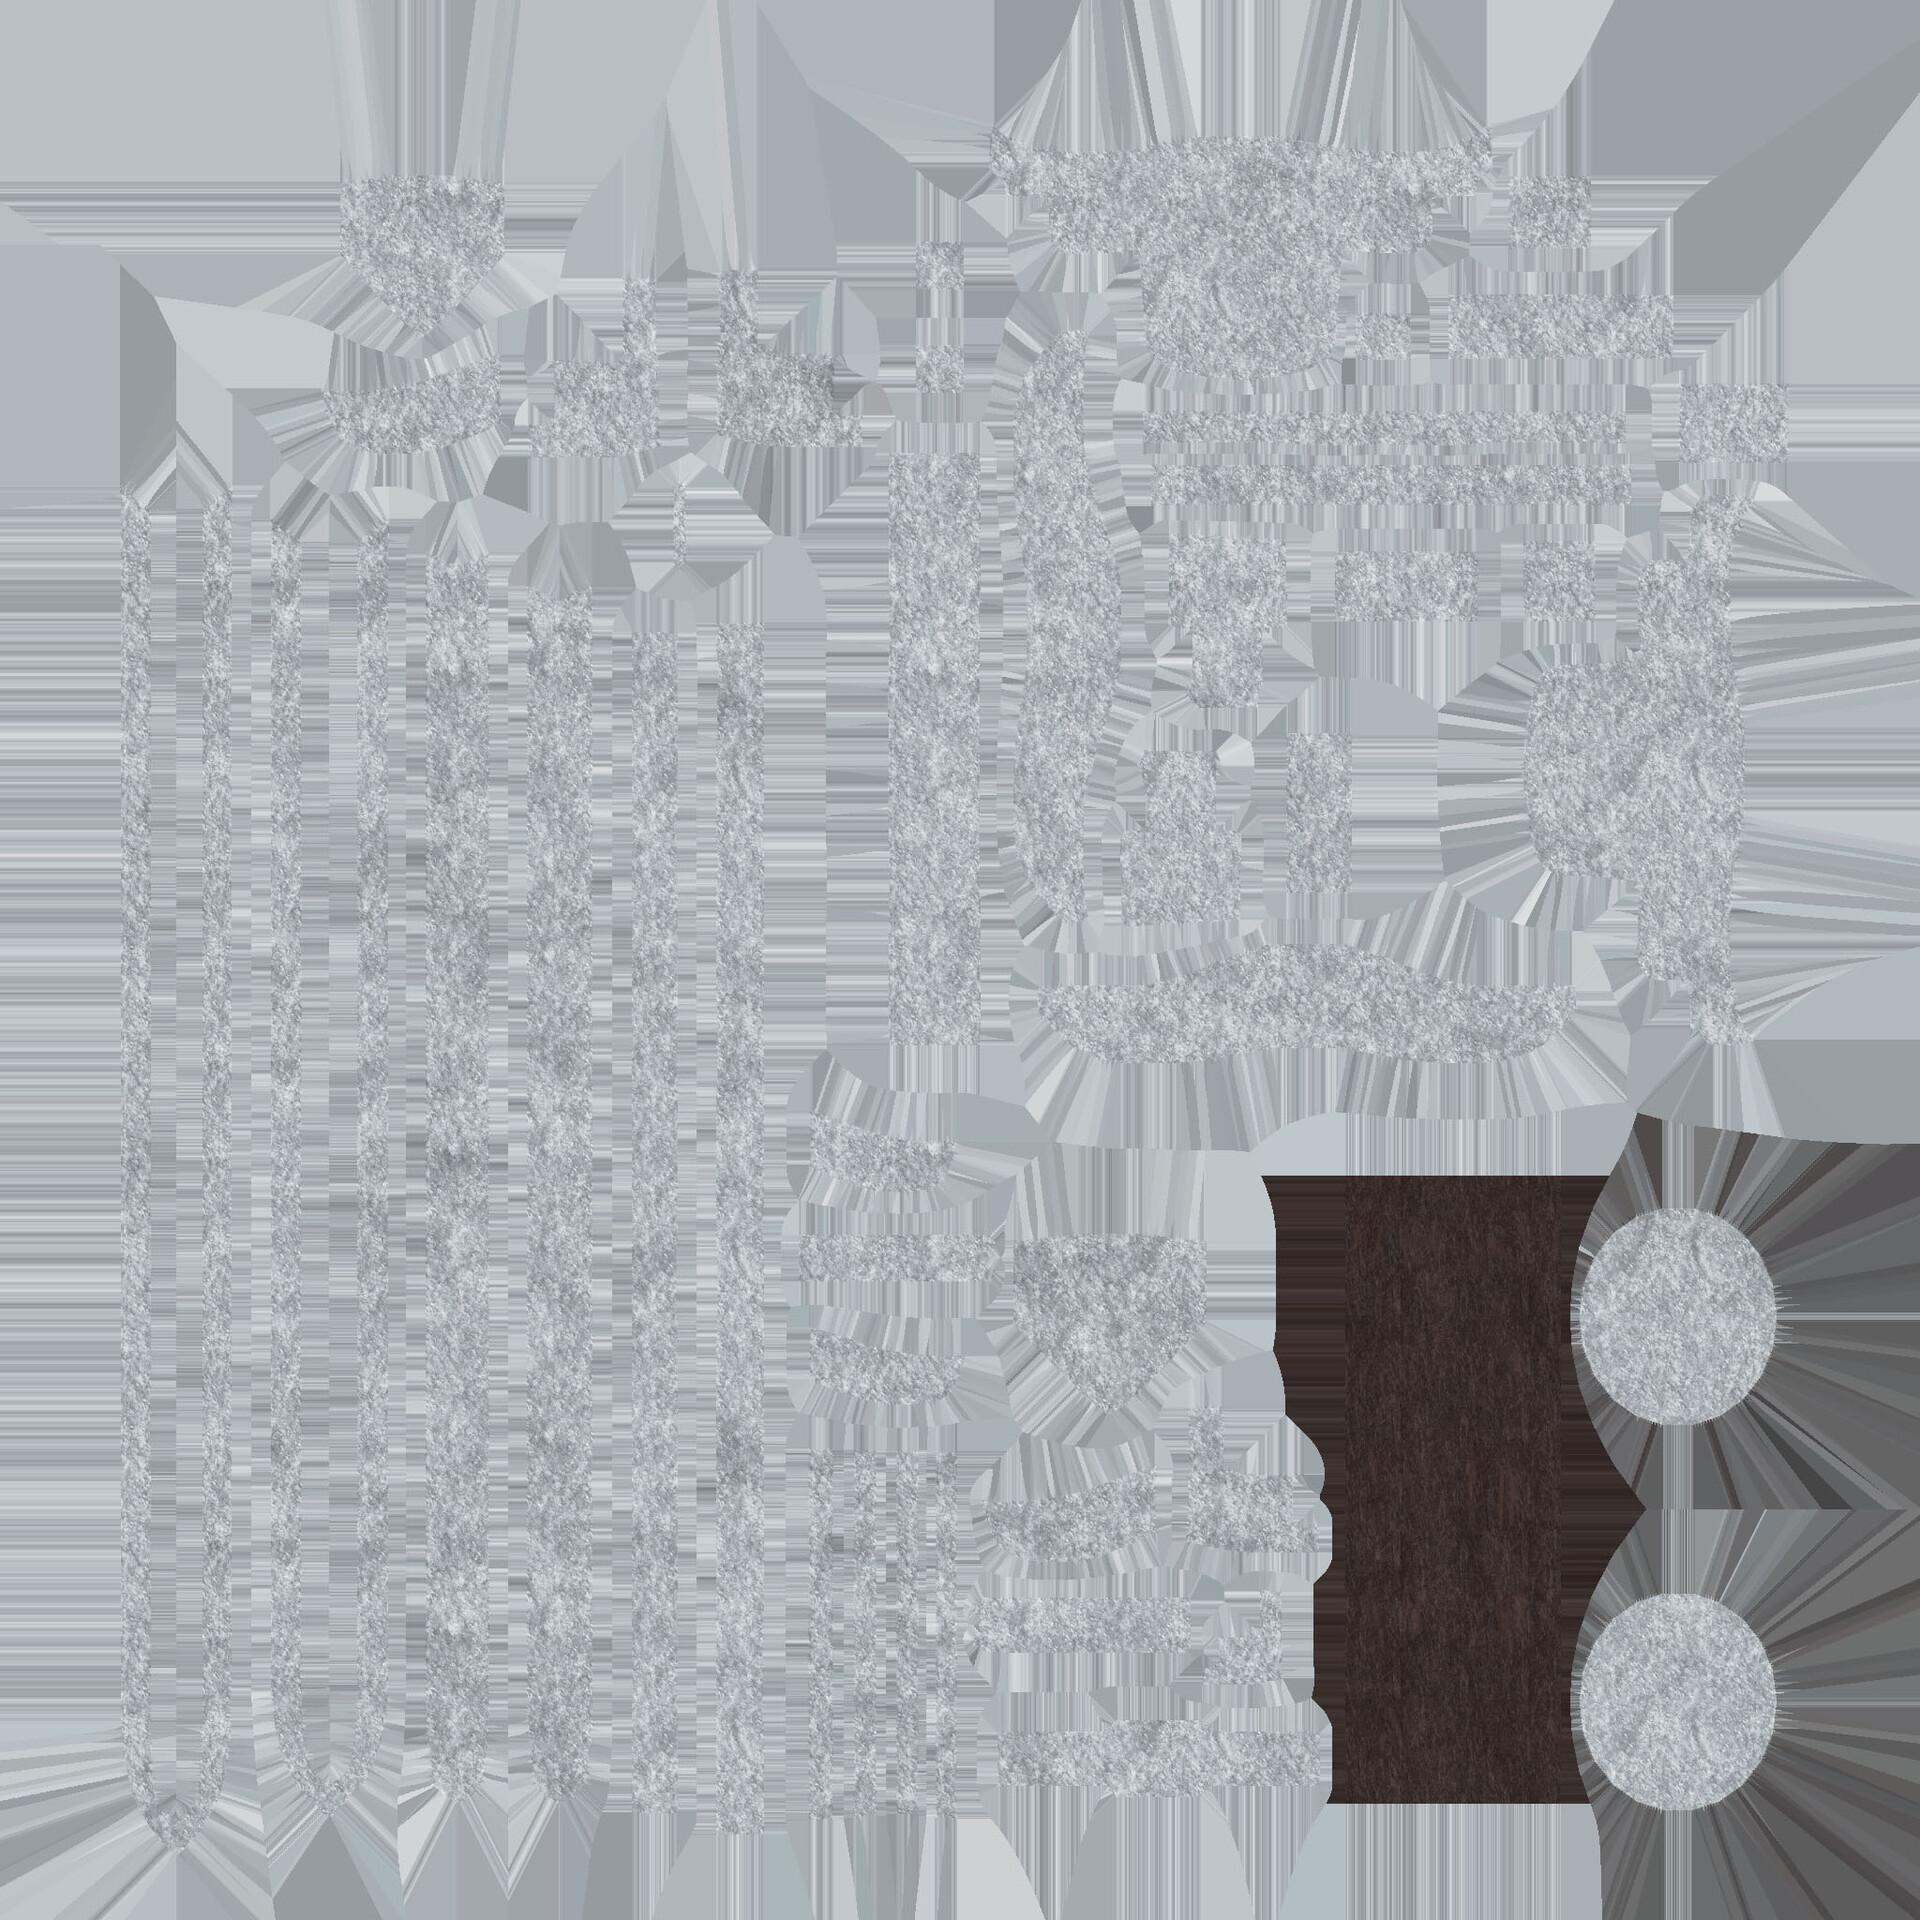 James skinner sword1 lowpoly v2 wire 006135113 basecolor